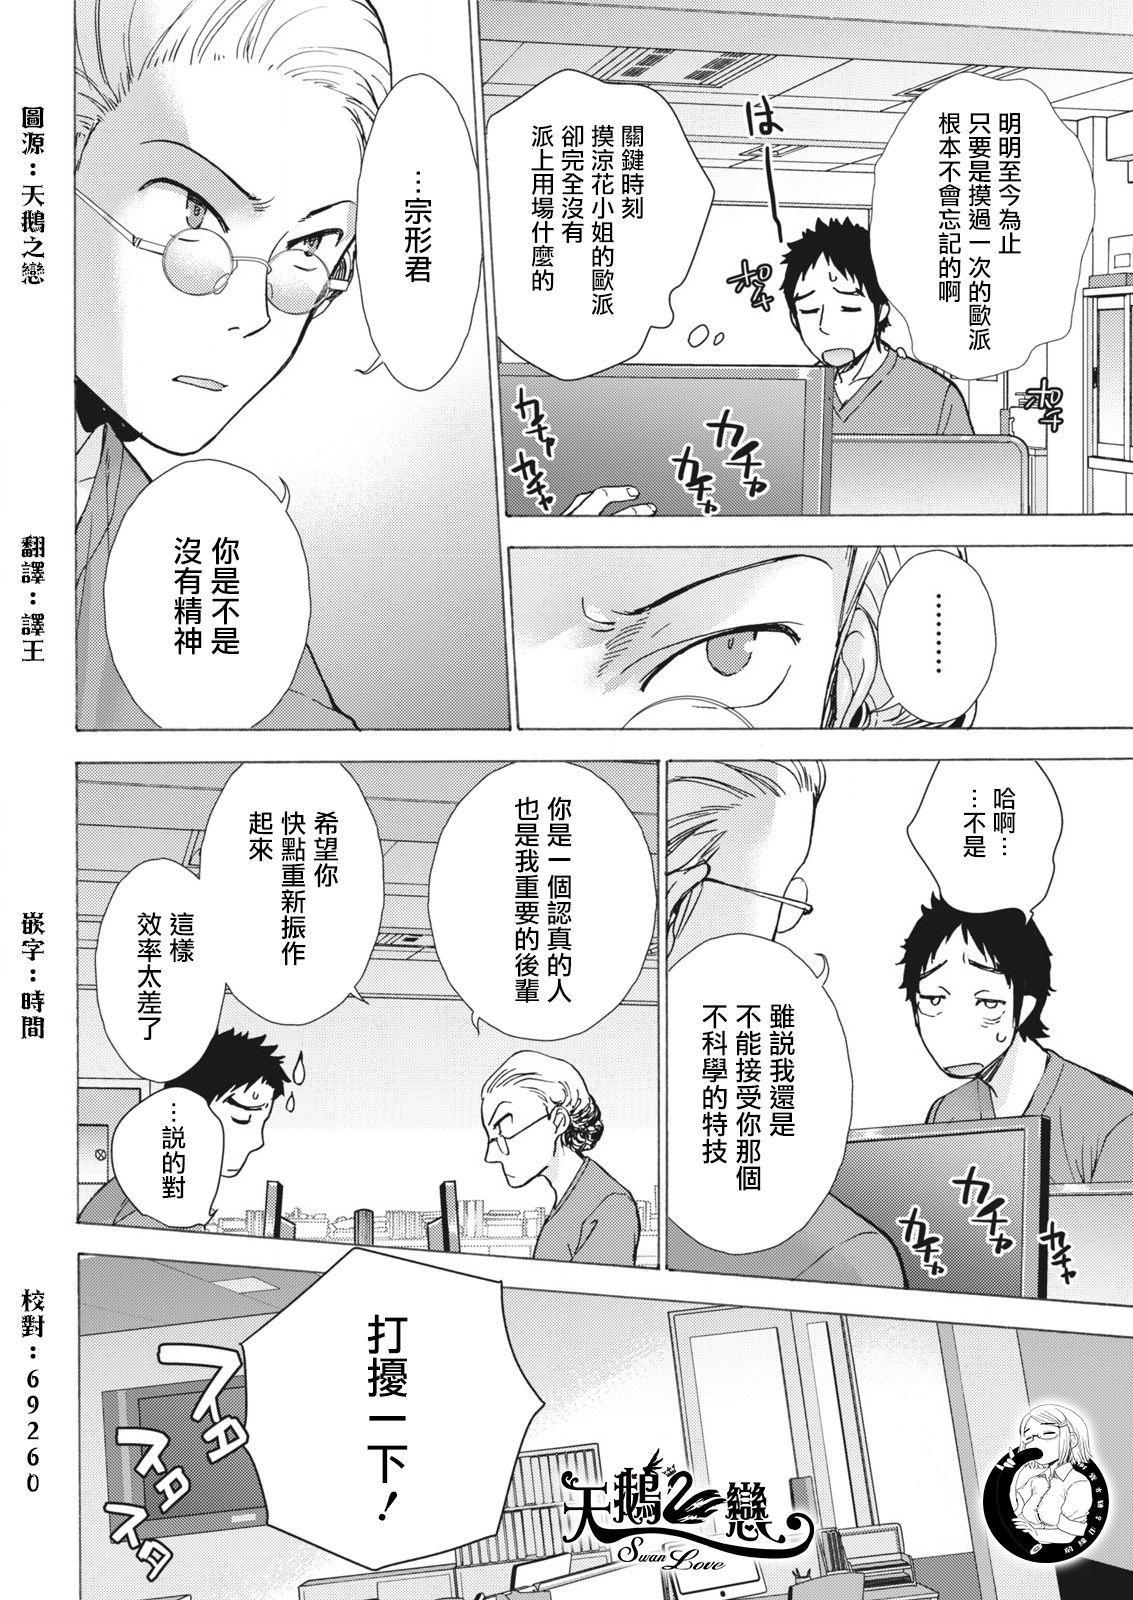 Opparadise wa Shinryouchu   欧派天国诊疗中 Ch. 8 6